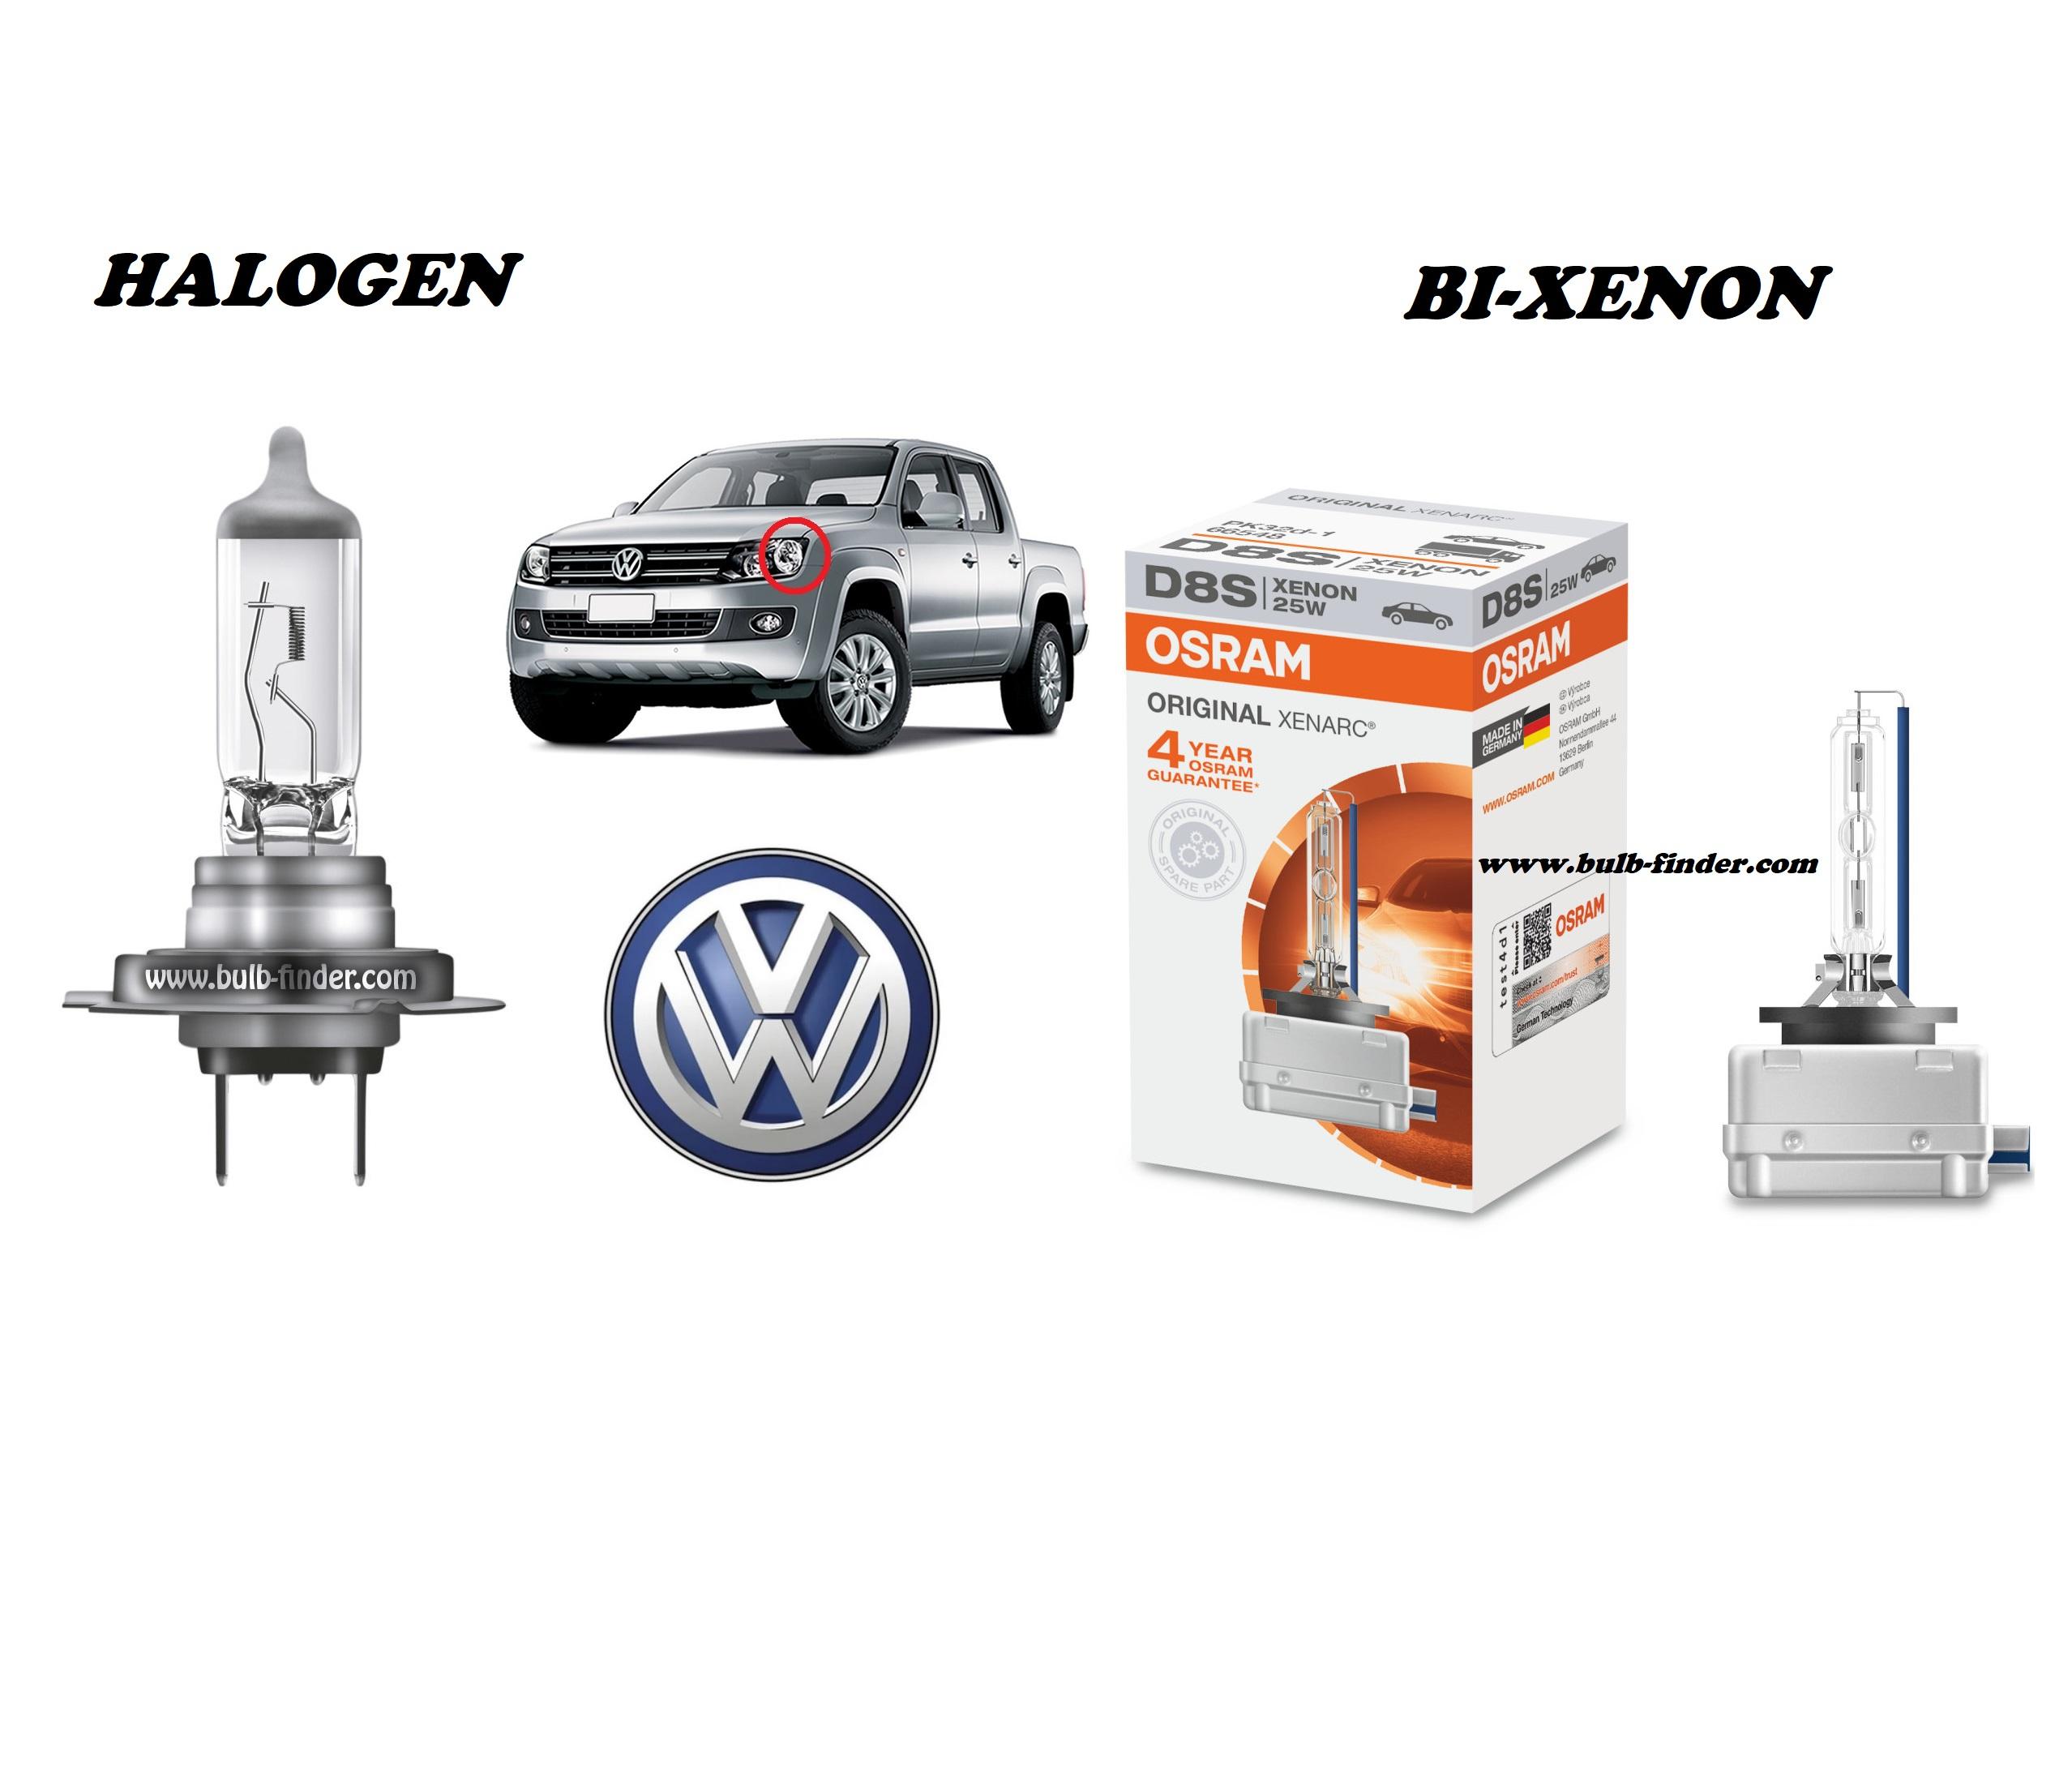 VW Amarok model bulb for LOW BEAM HEADLIGHT specification